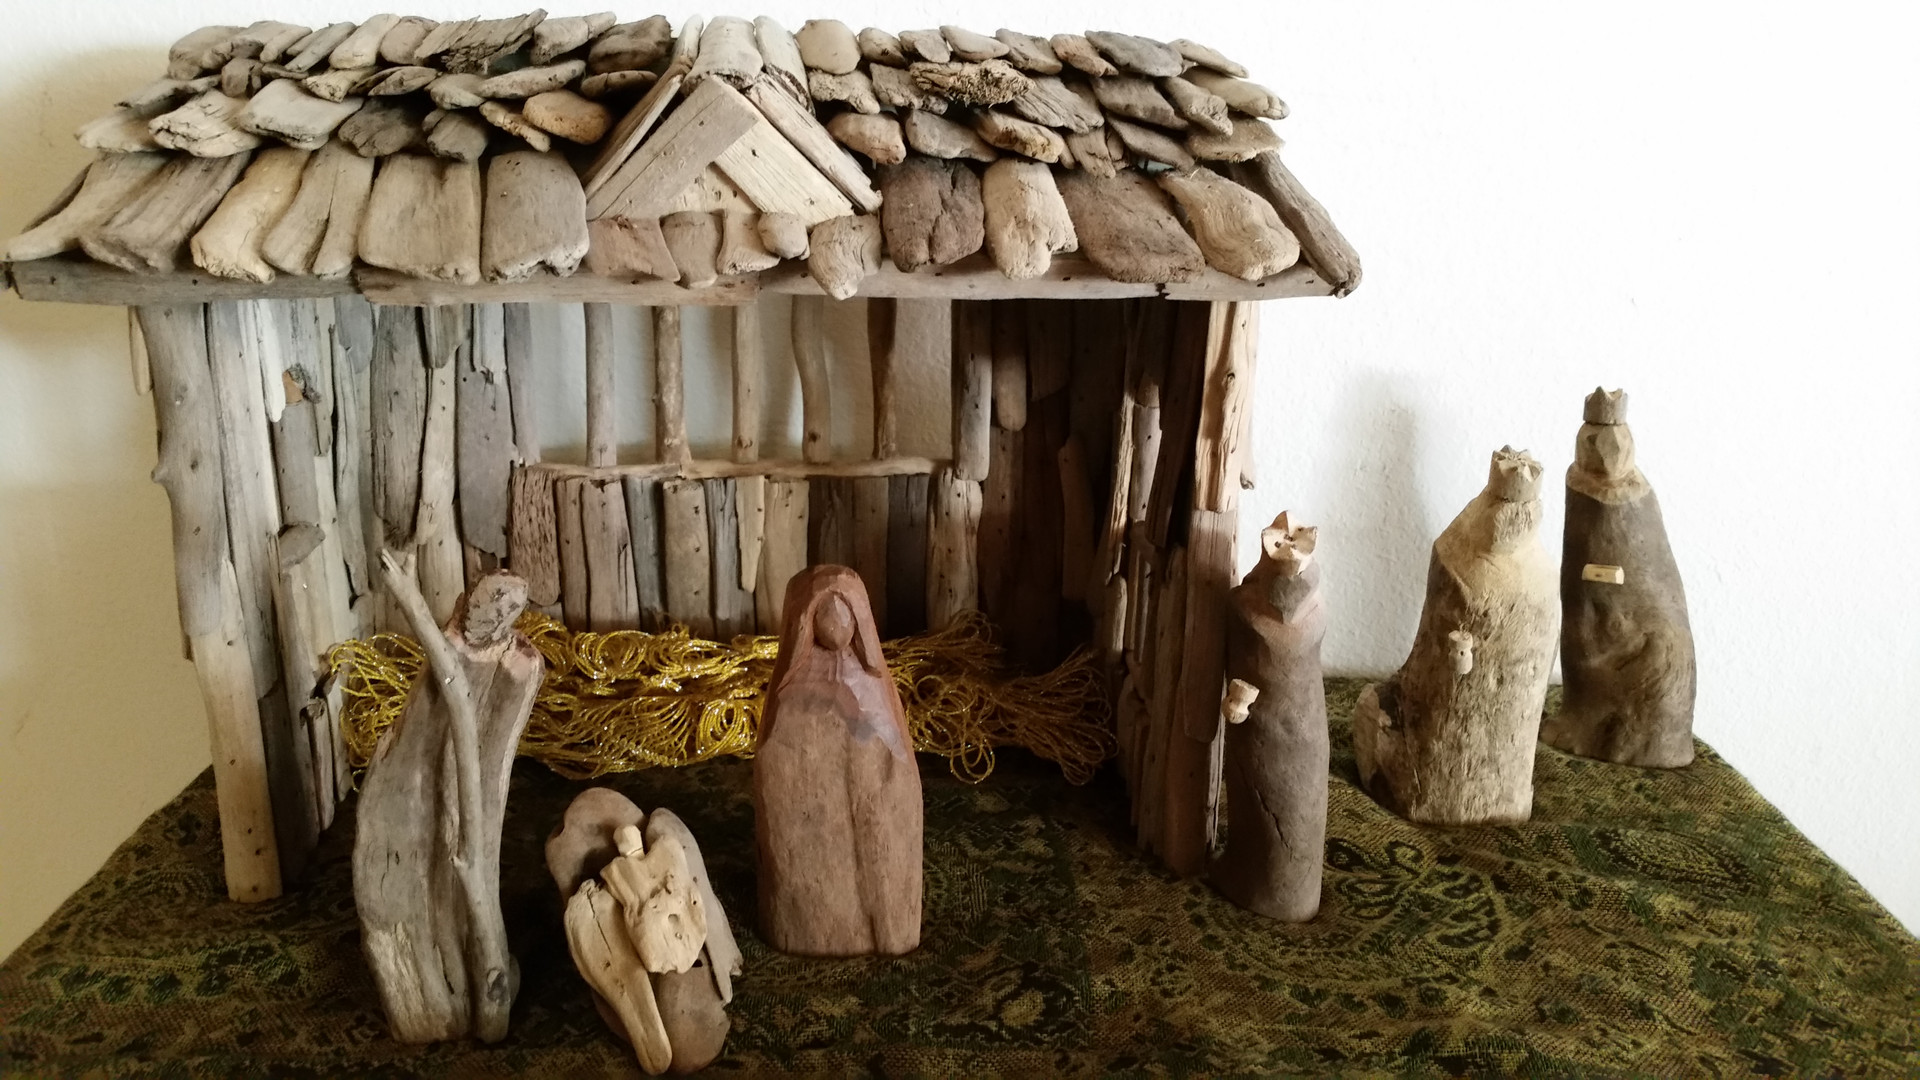 The Higginbothams: Nativity handmade from driftwood